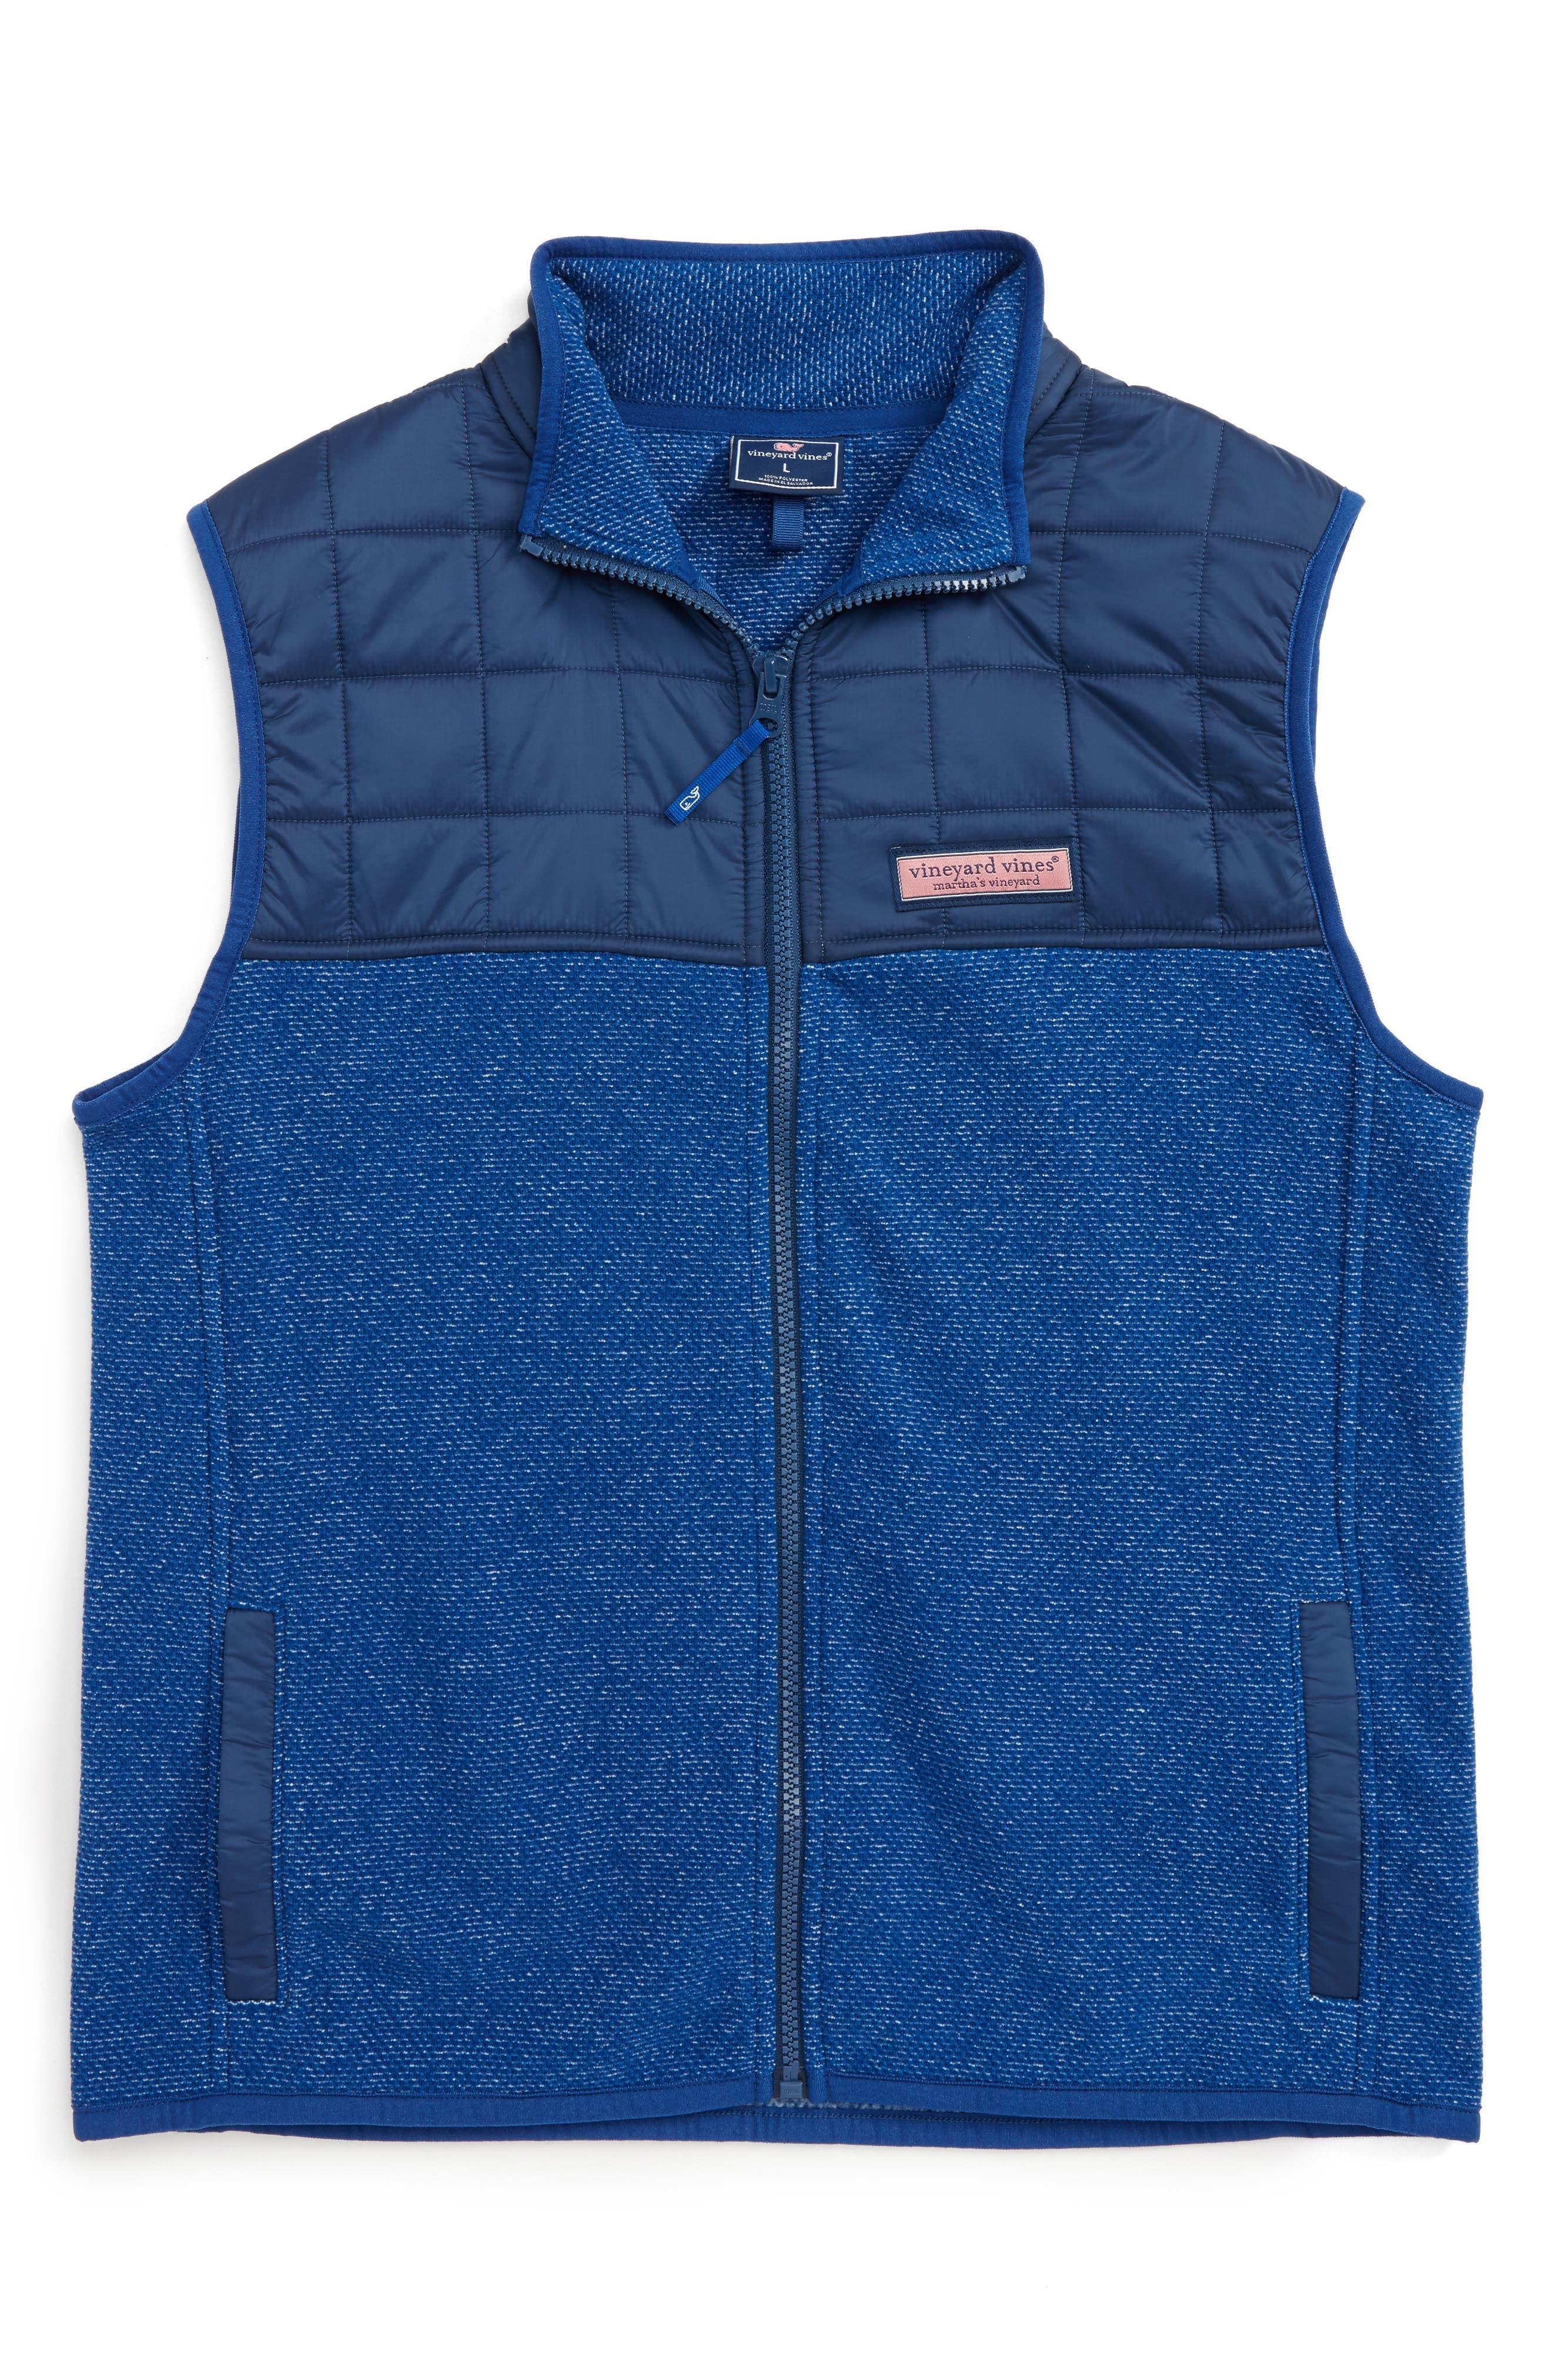 Alternate Image 1 Selected - vineyard vines Jacquard Fleece Vest (Big Boys)